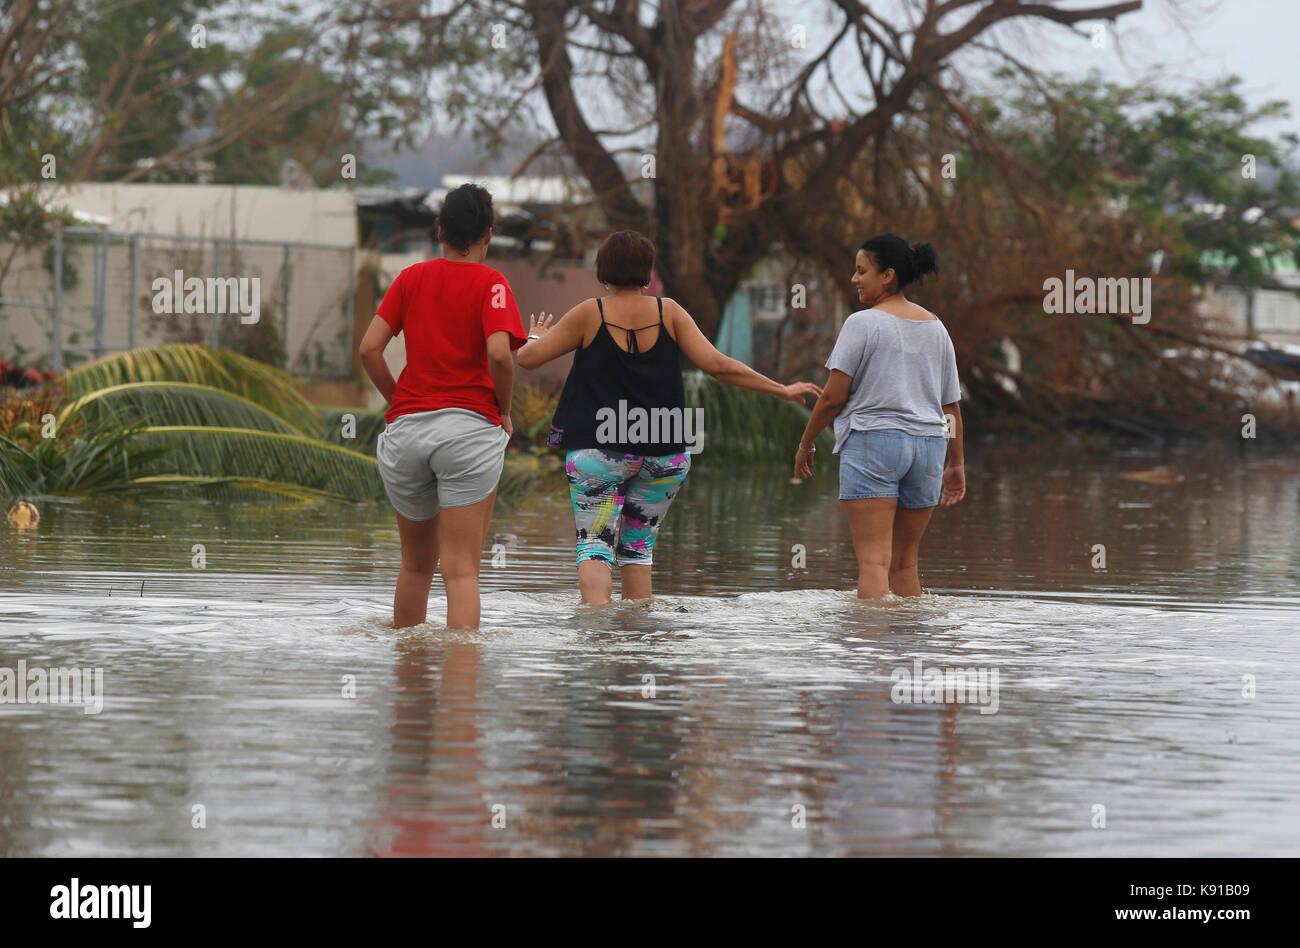 Toa Baja, Puerto Rico. 21st Sep, 2017. Three women cross a flooded street after hurricane Maria in Toa Baja, Puerto - Stock Image